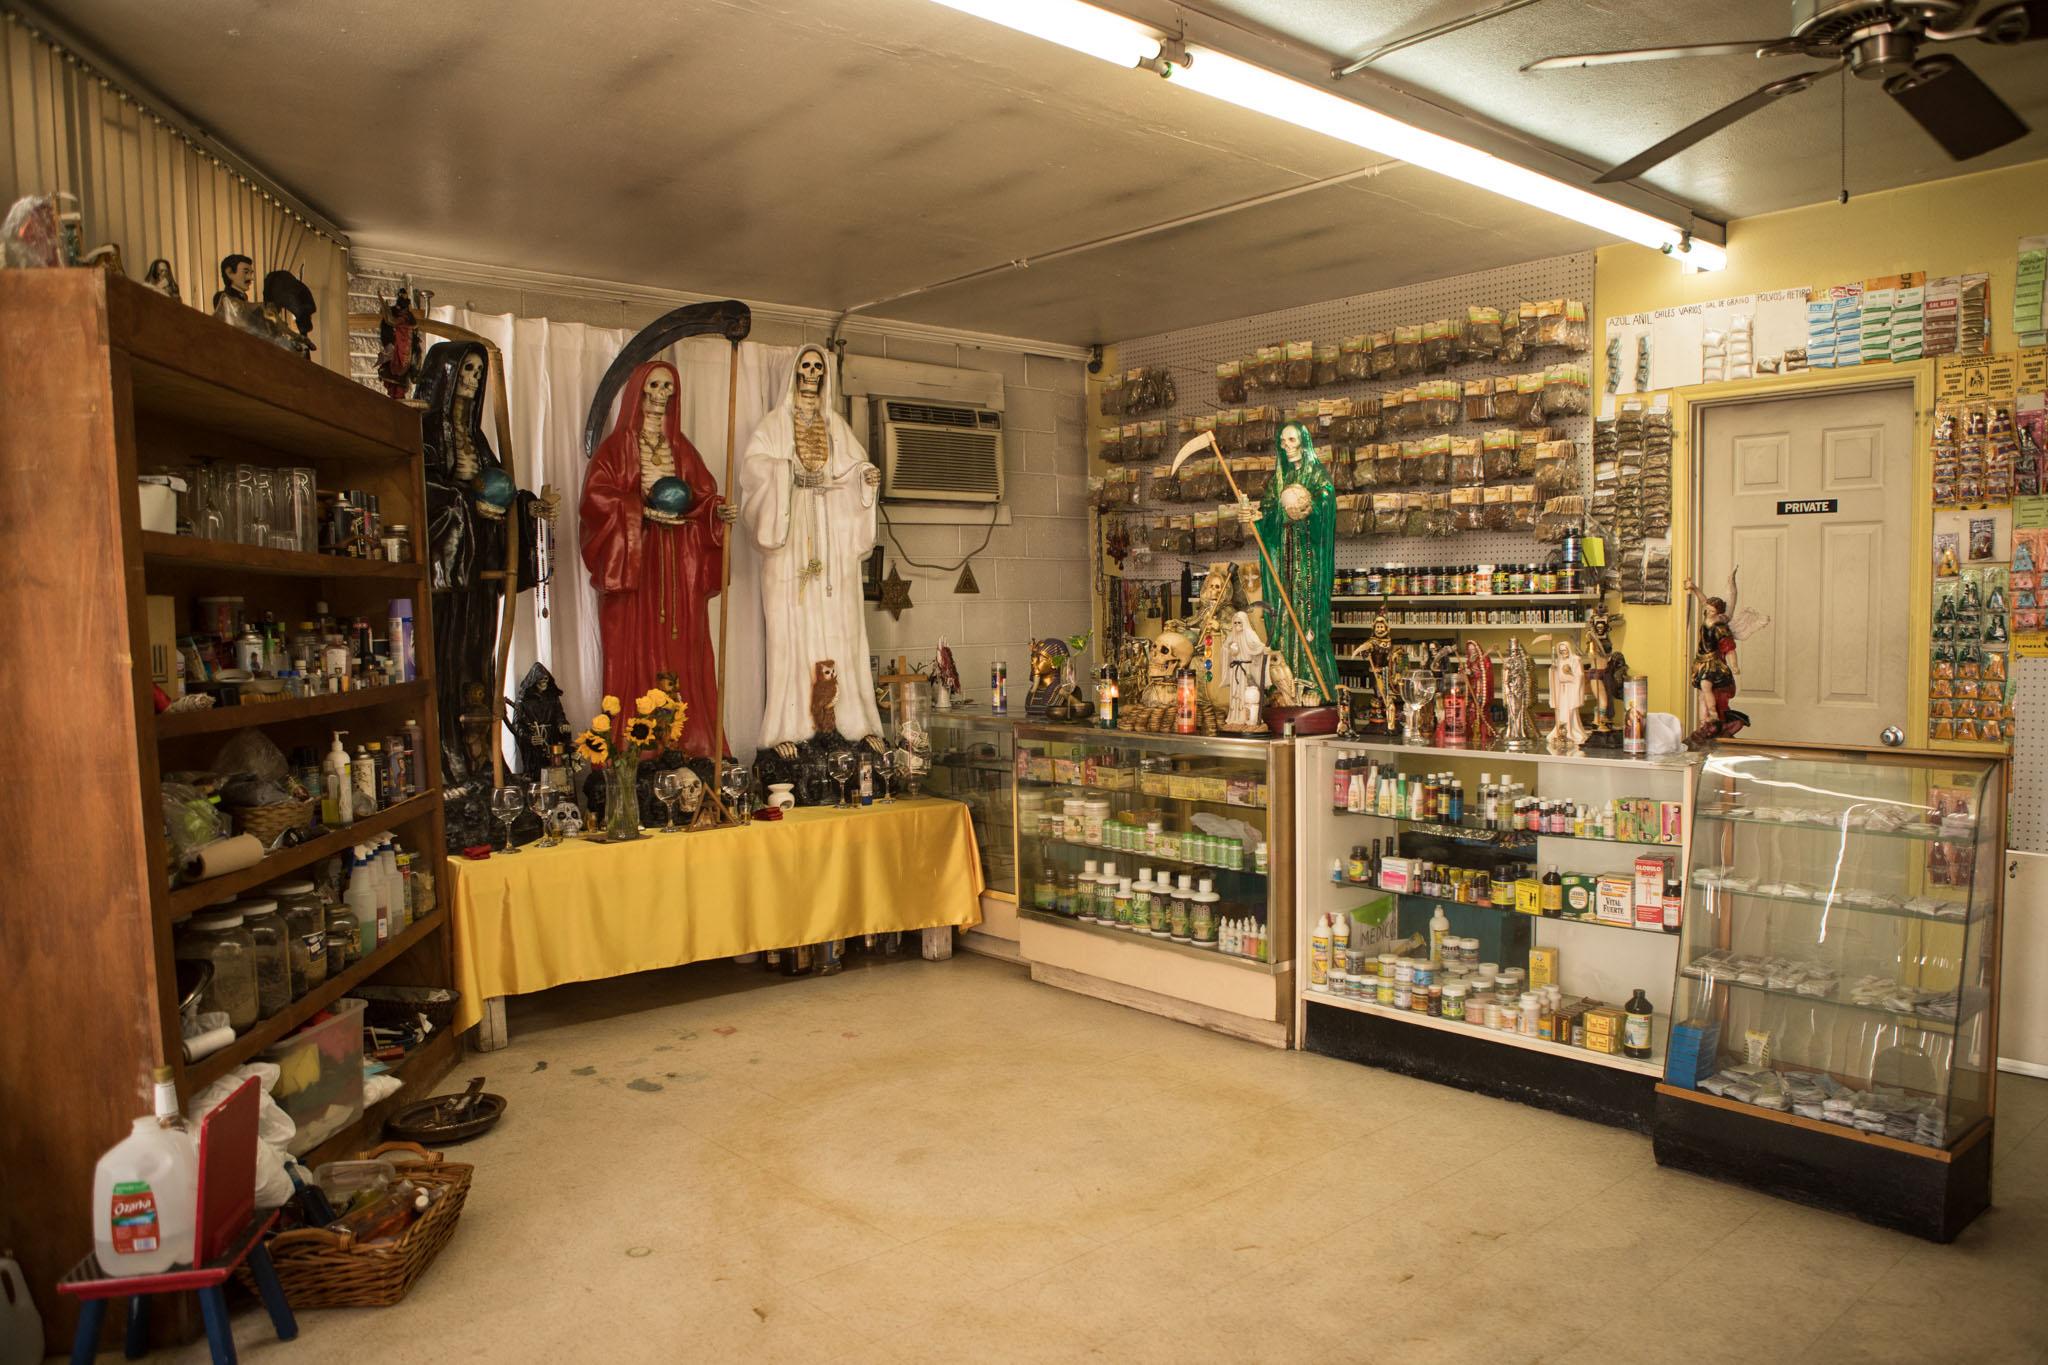 Botanica Obadina contains candles, herbs, and spiritual items.